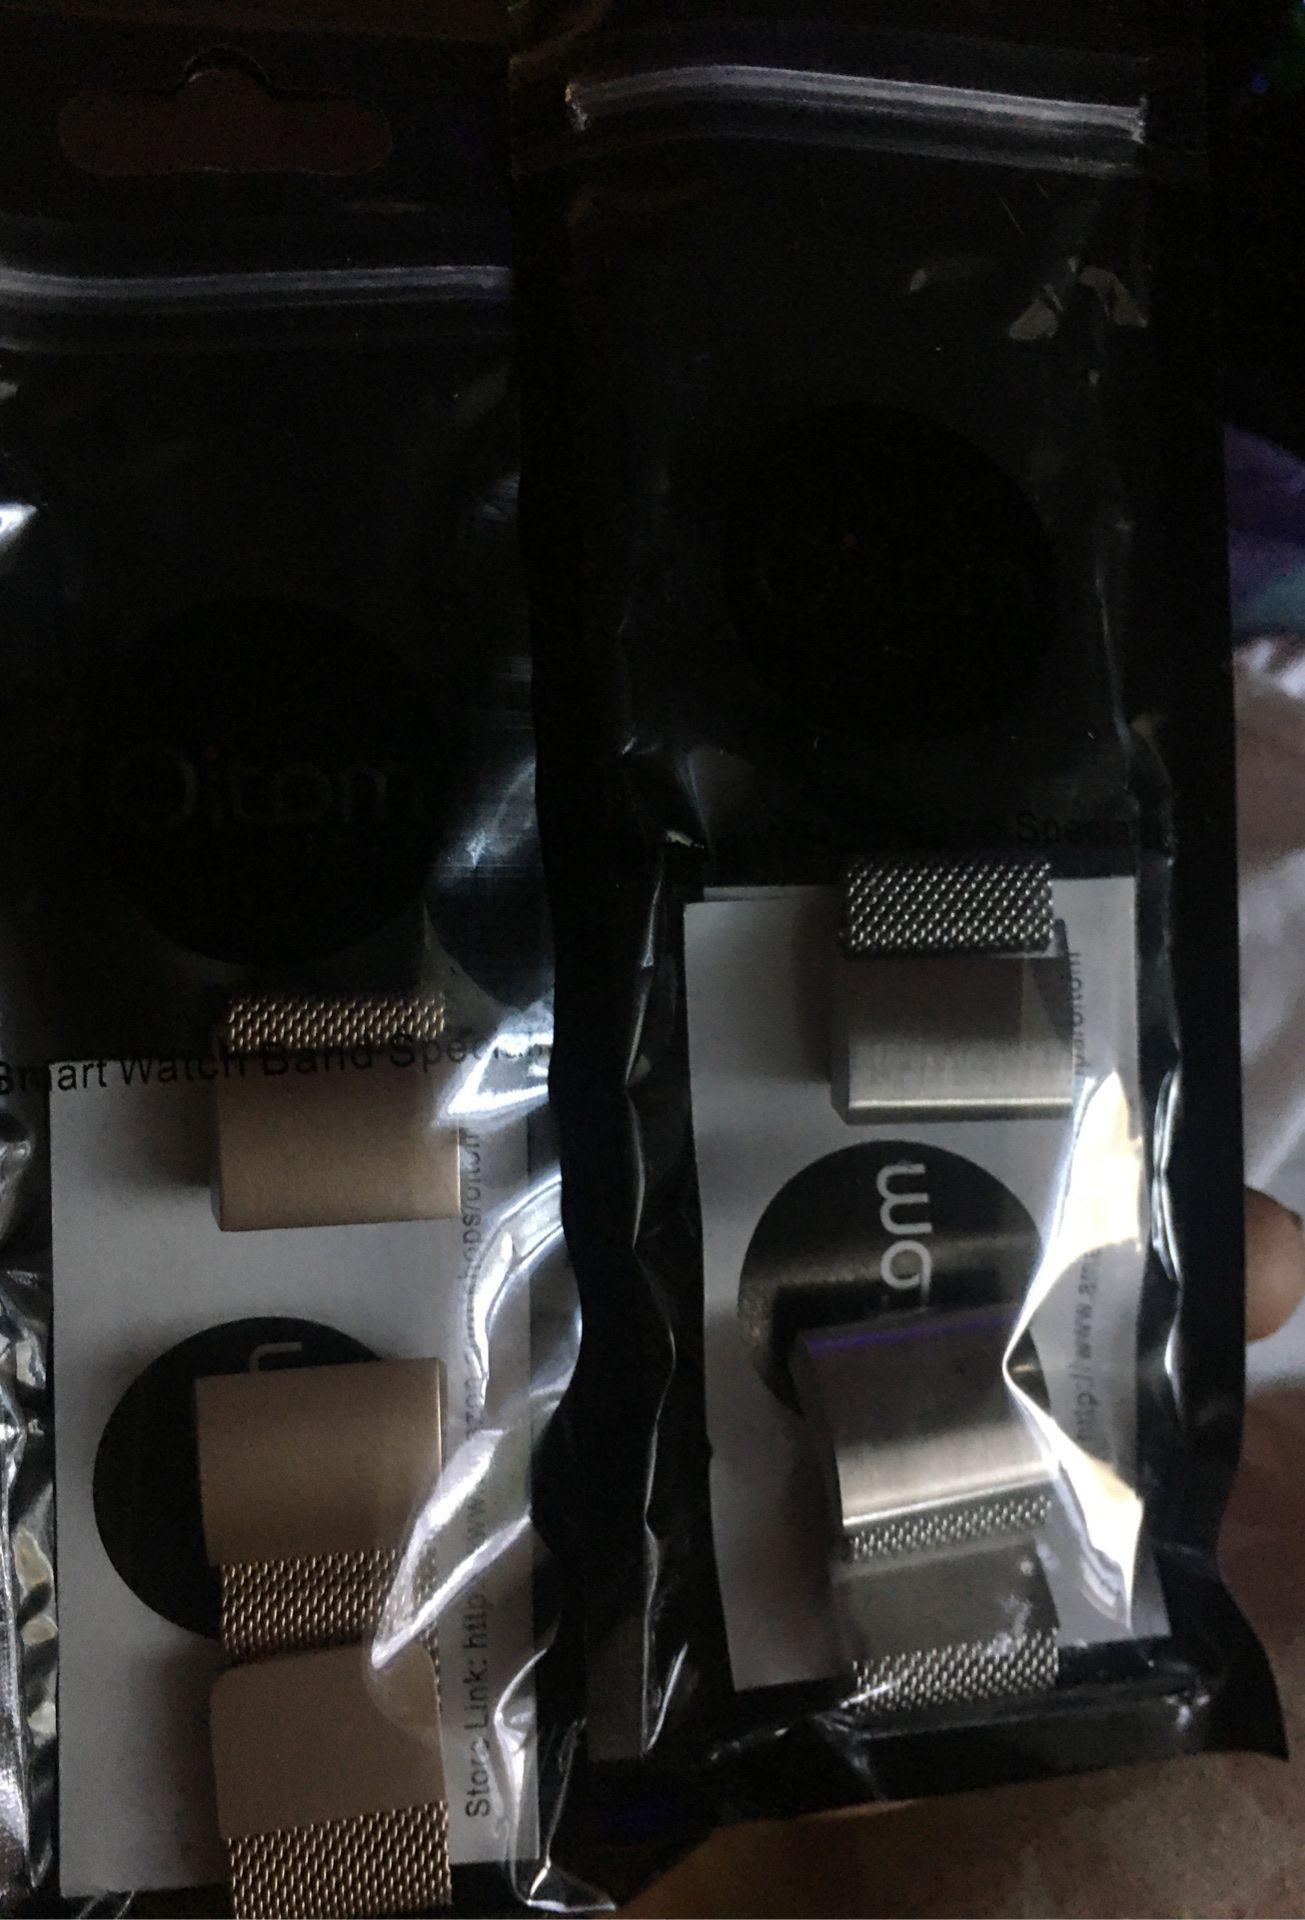 Smart watch bands